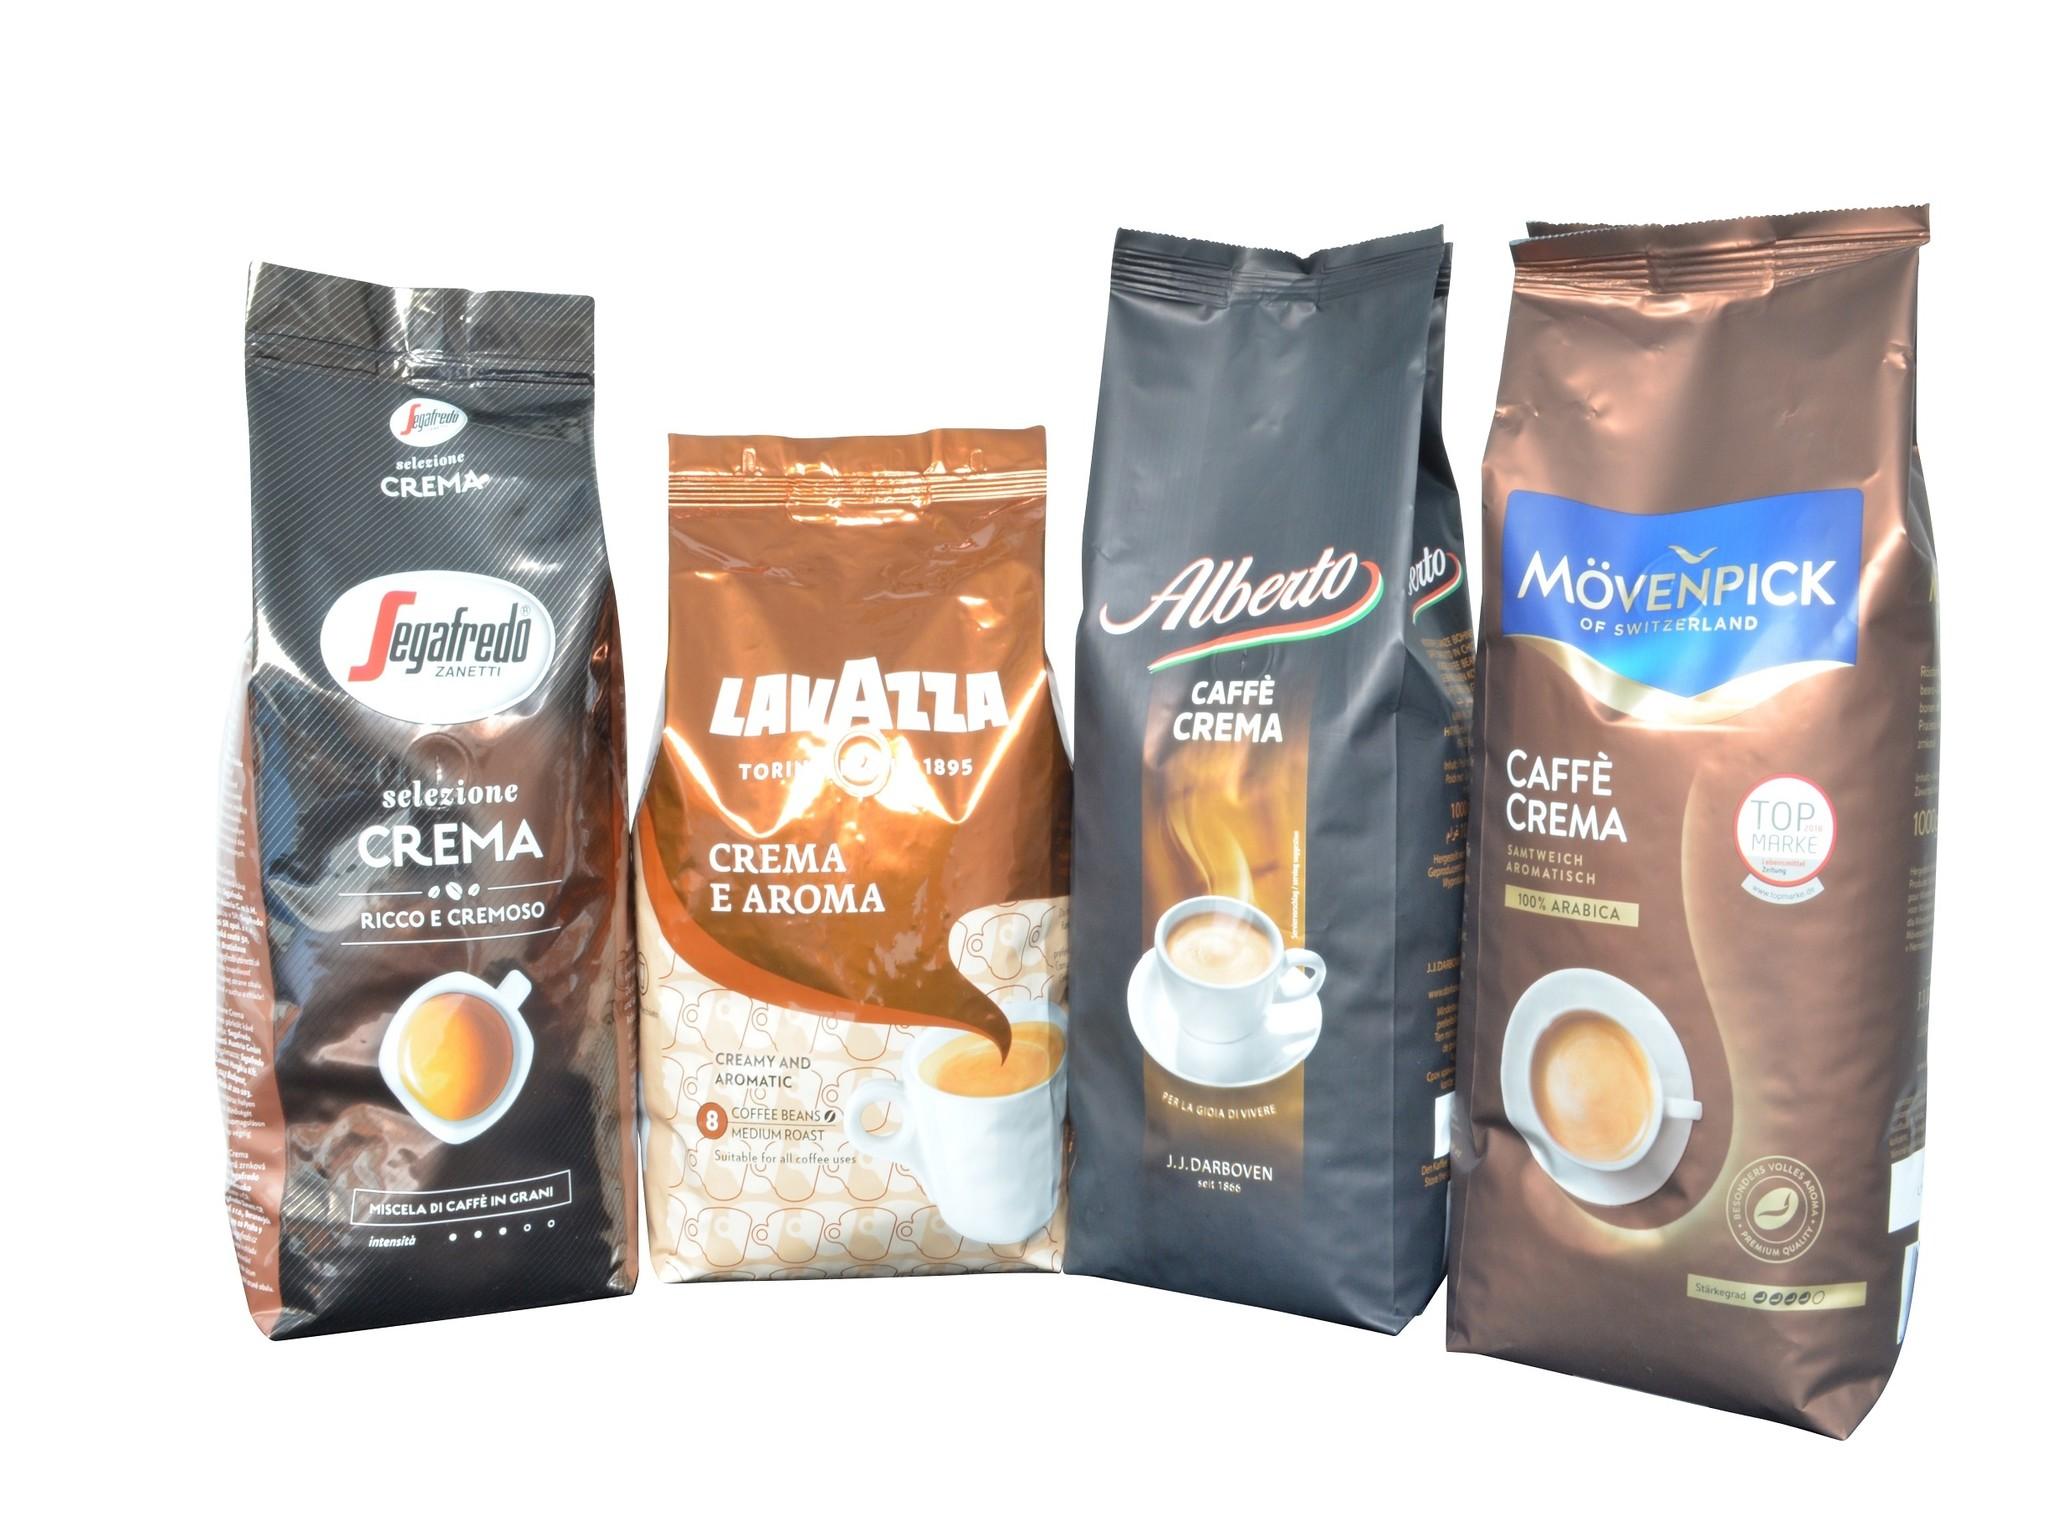 Proefpakket Cappuccino 4 x 1  kilo